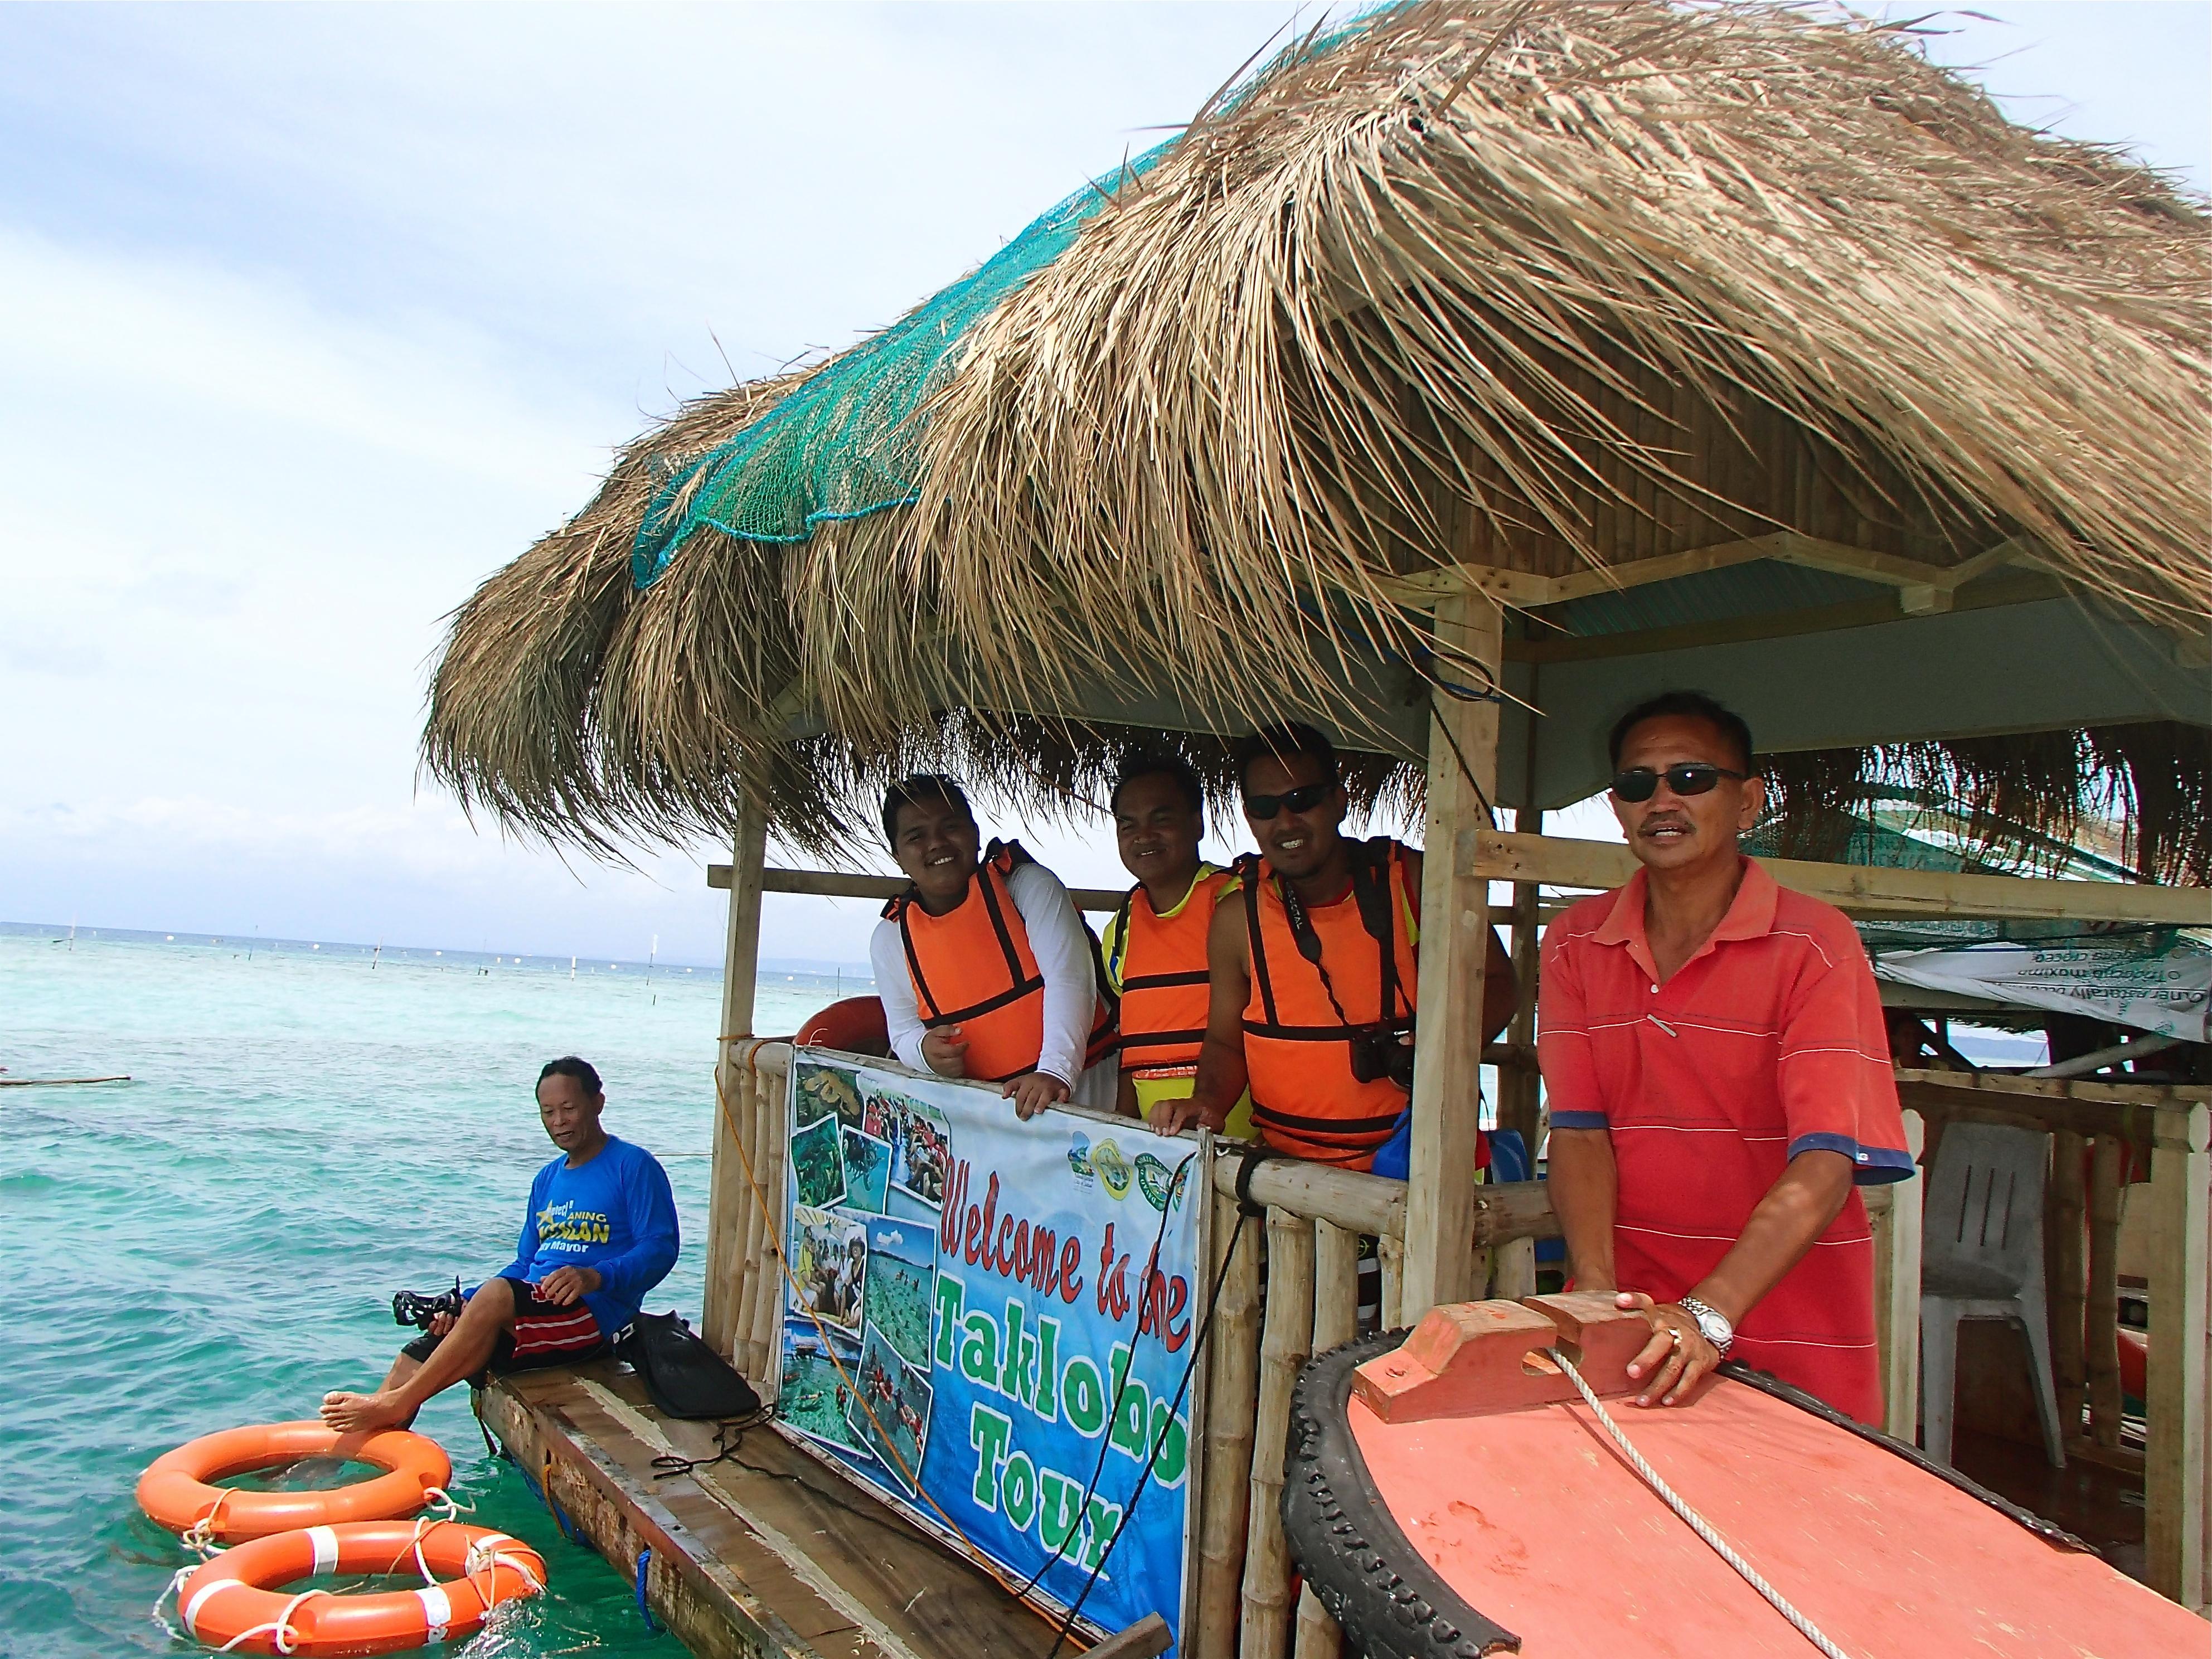 Taklobo Tours, Island Garden City of Samal